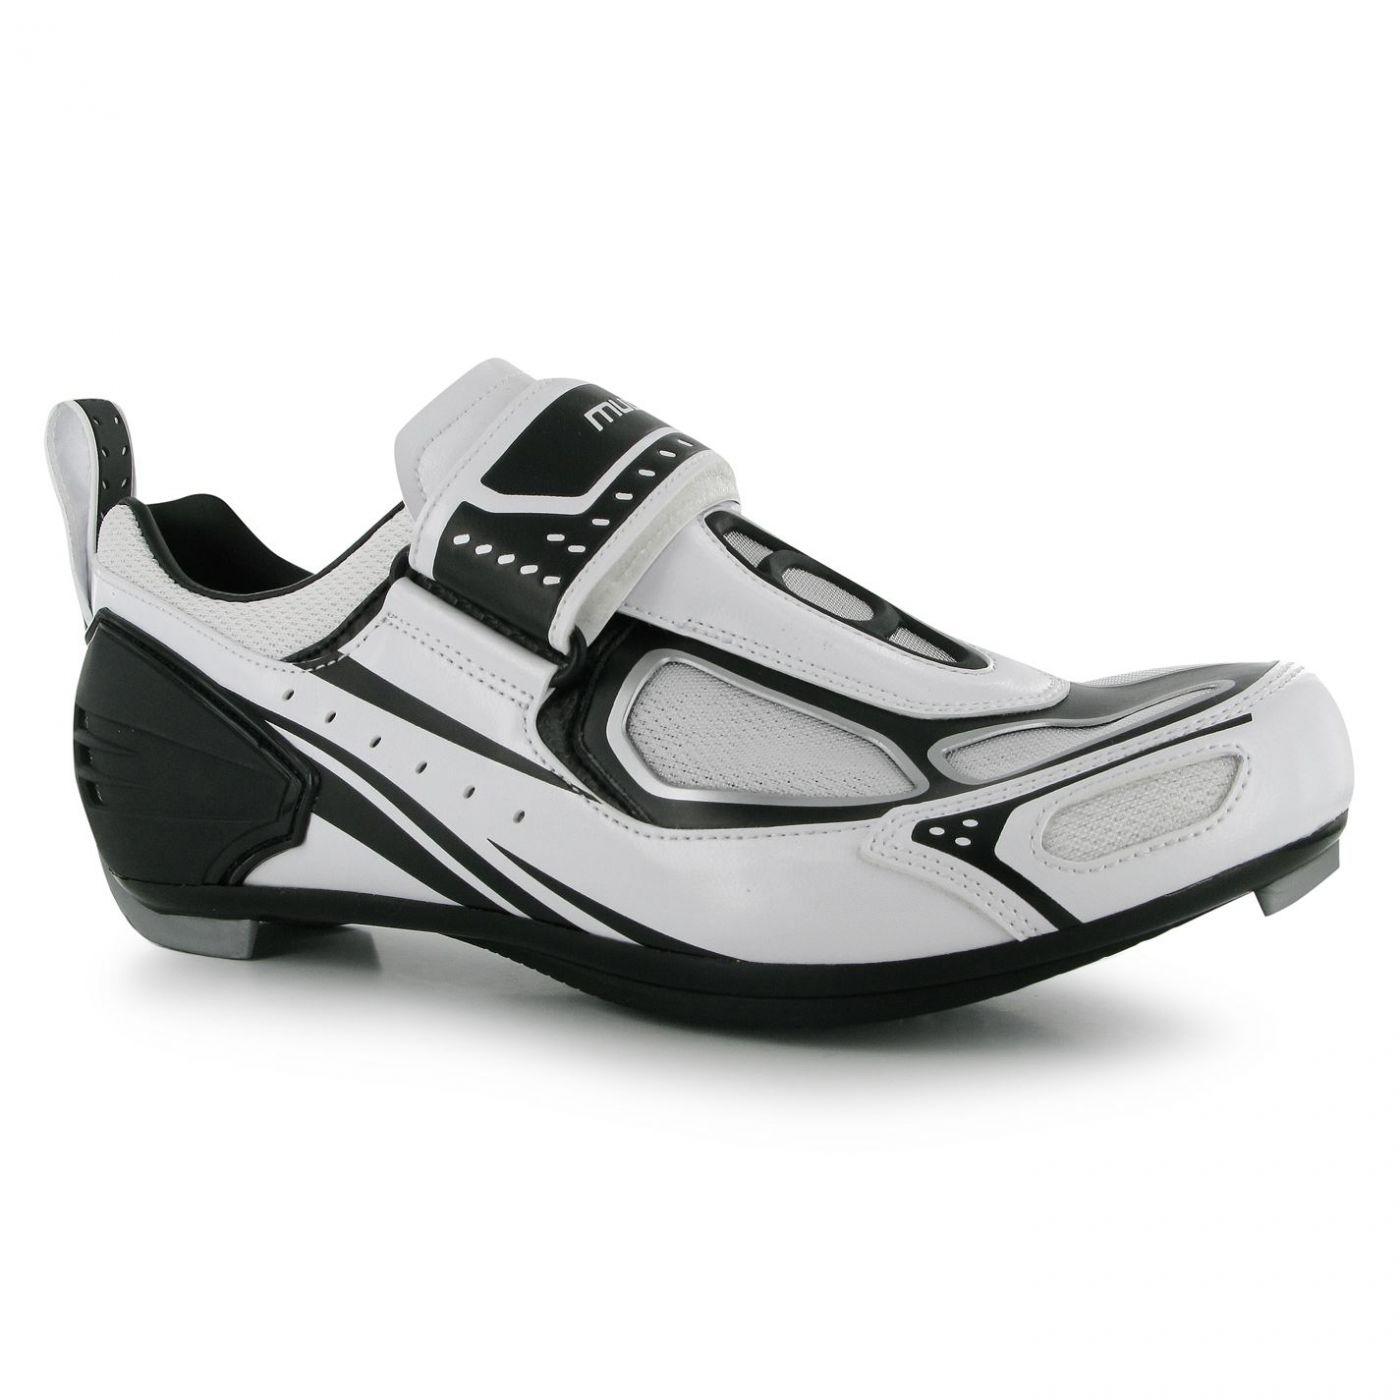 Men's Cycling Shoes Muddyfox TRI100